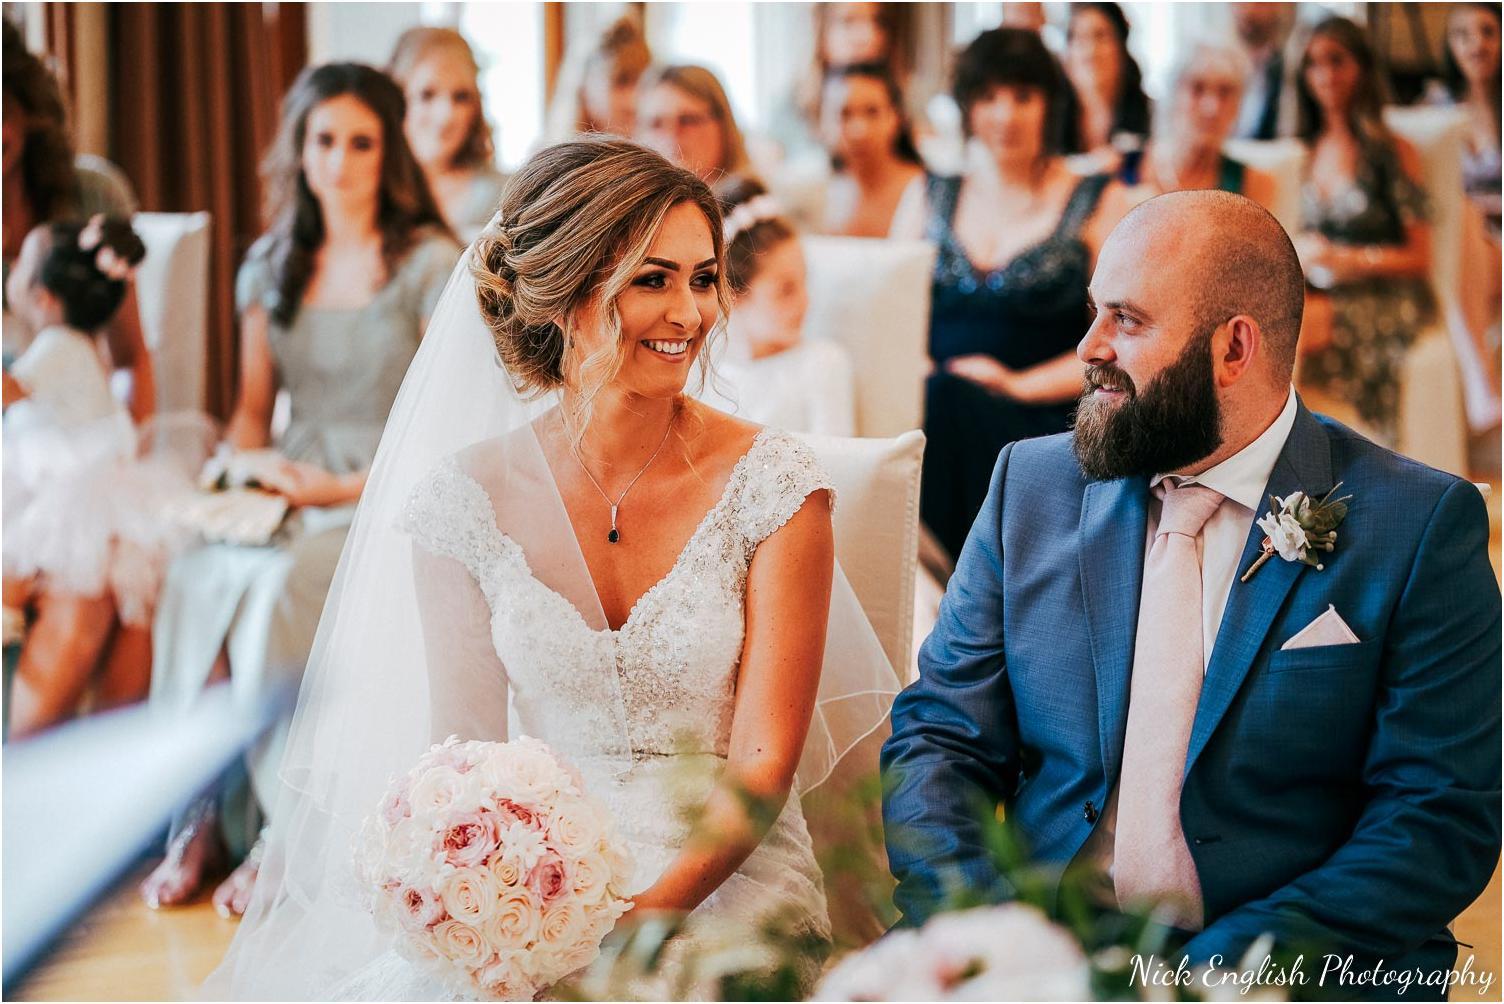 Destination_Wedding_Photographer_Slovenia_Nick_English_Photography-38.jpg